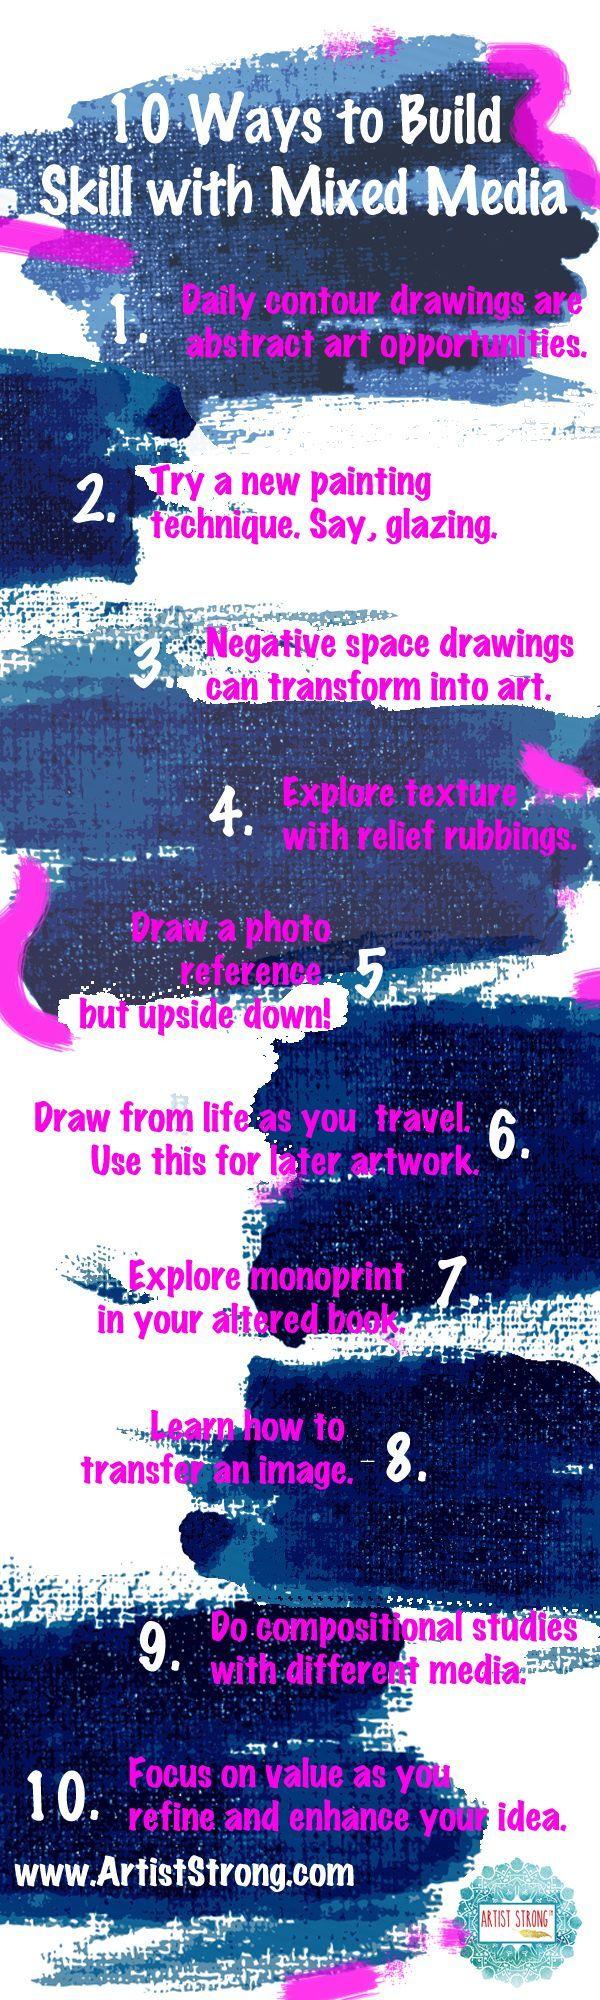 10 ways to build your skill using mixed media art   free art lessons   inner artist   art ideas